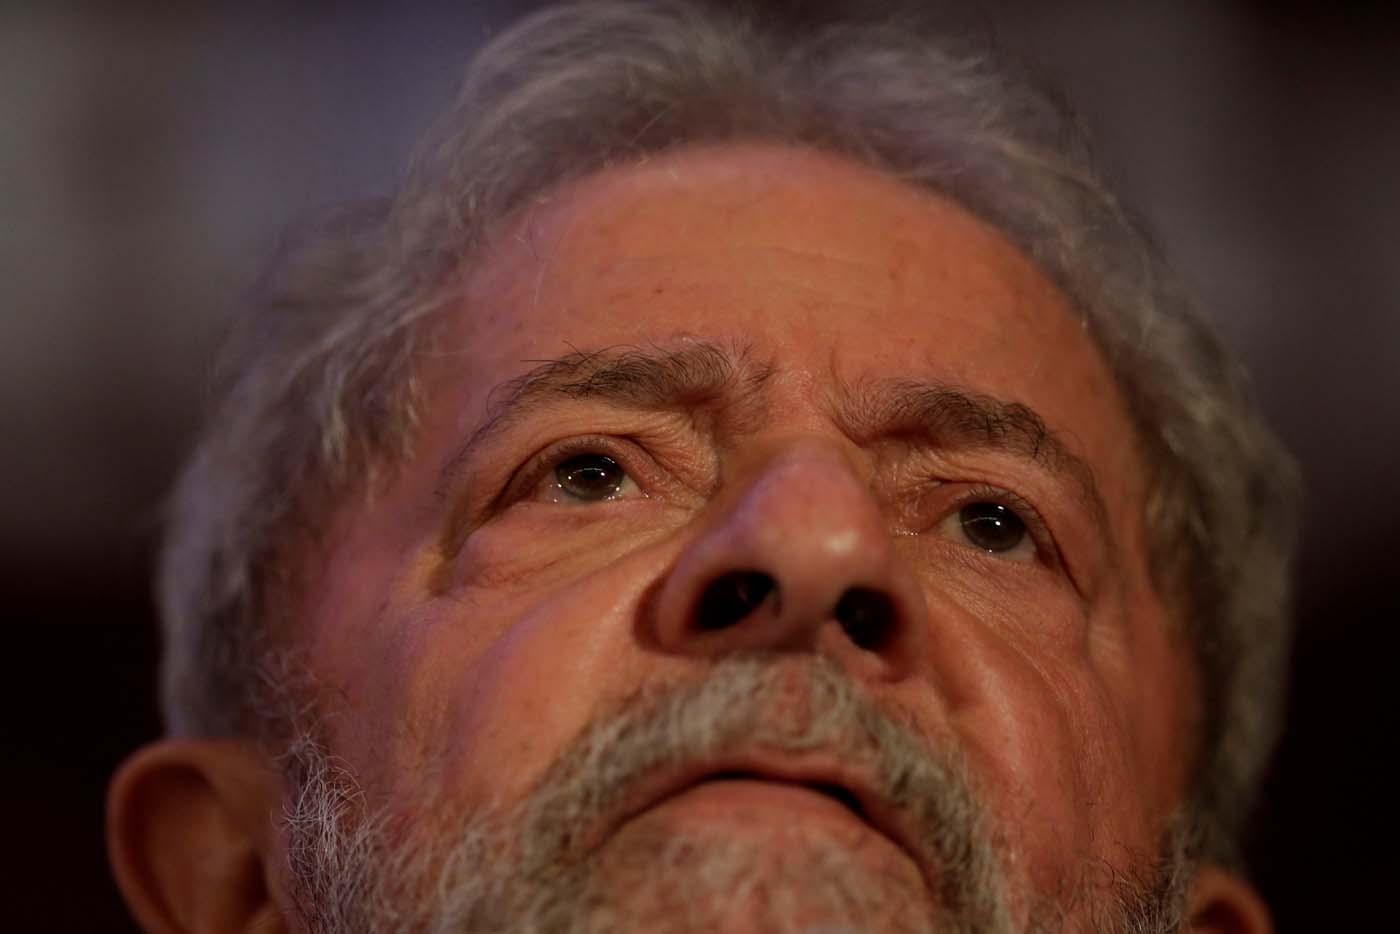 Former Brazil's President Luiz Inacio Lula da Silva looks on during a national congress of Communist Party of Brazil in Brasilia, Brazil, November 19, 2017. REUTERS/Ueslei Marcelino